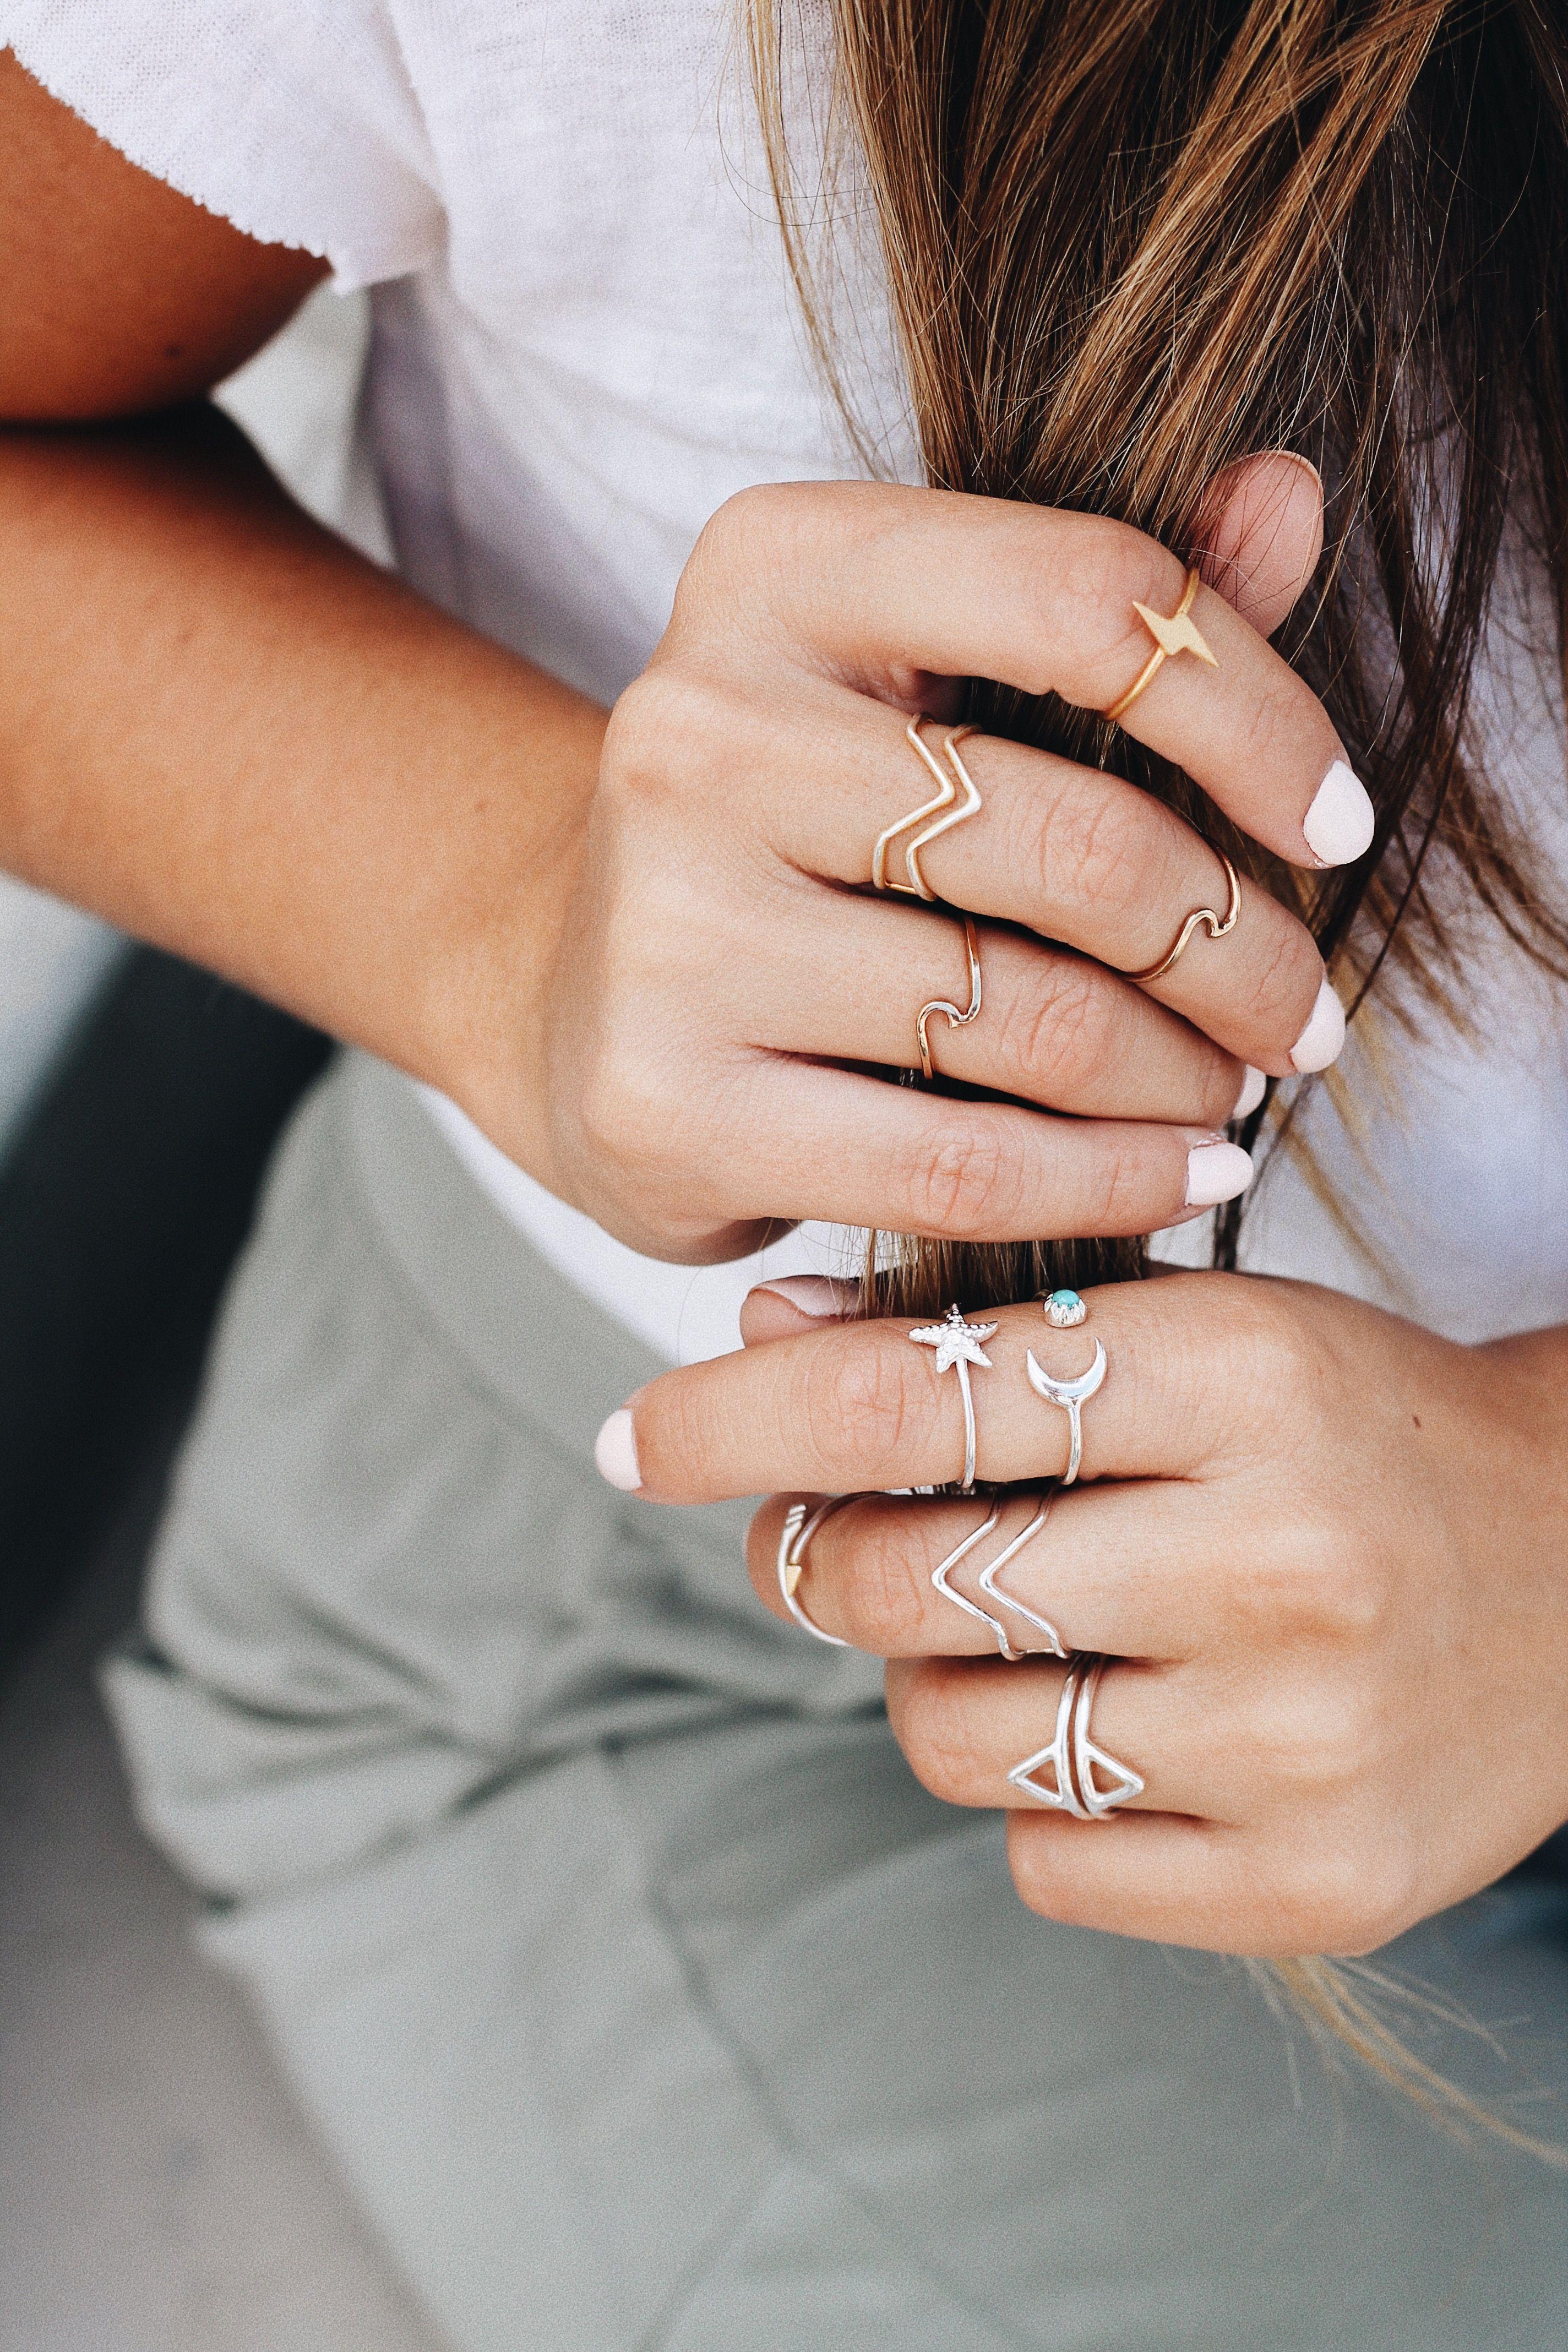 91fce587c65b5 Rings on Rings on Rings | Pura Vida Bracelets #livefree ...